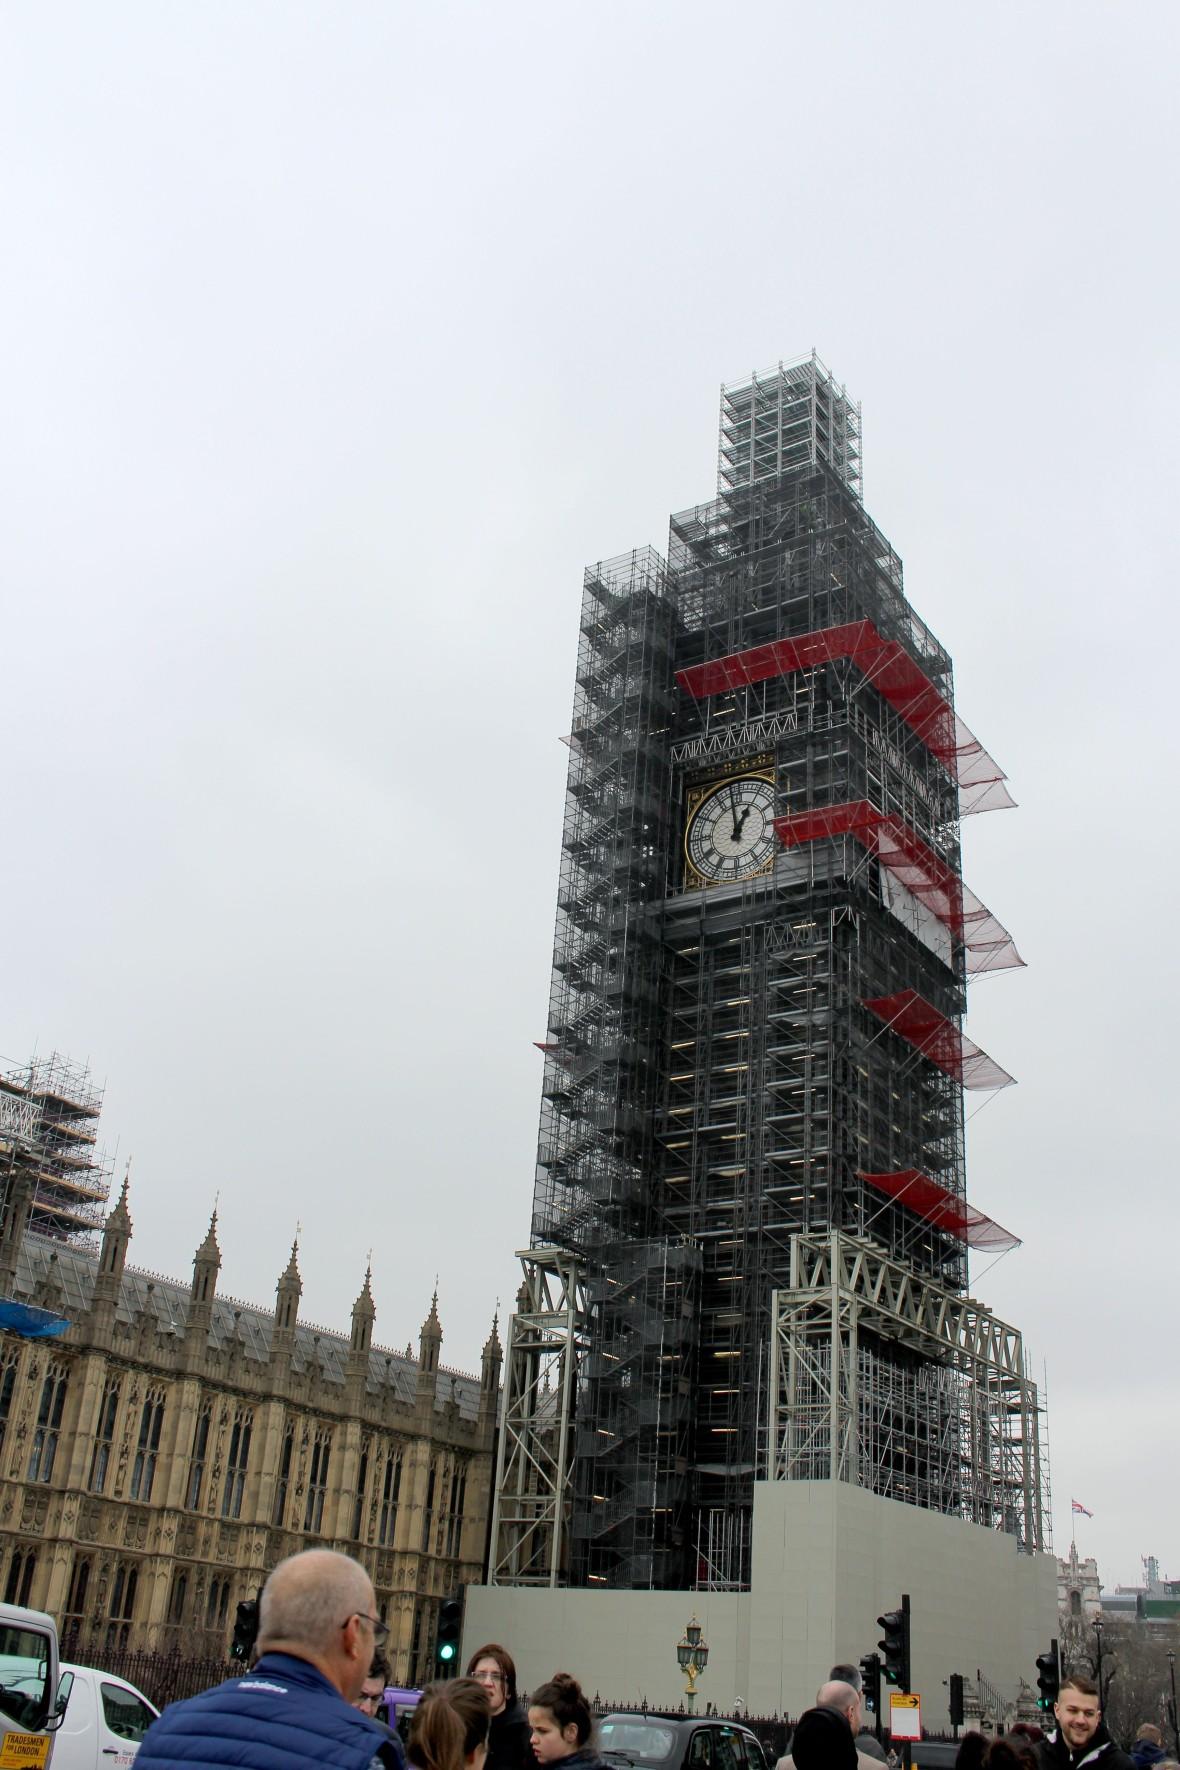 Big Ben London Tour Cost